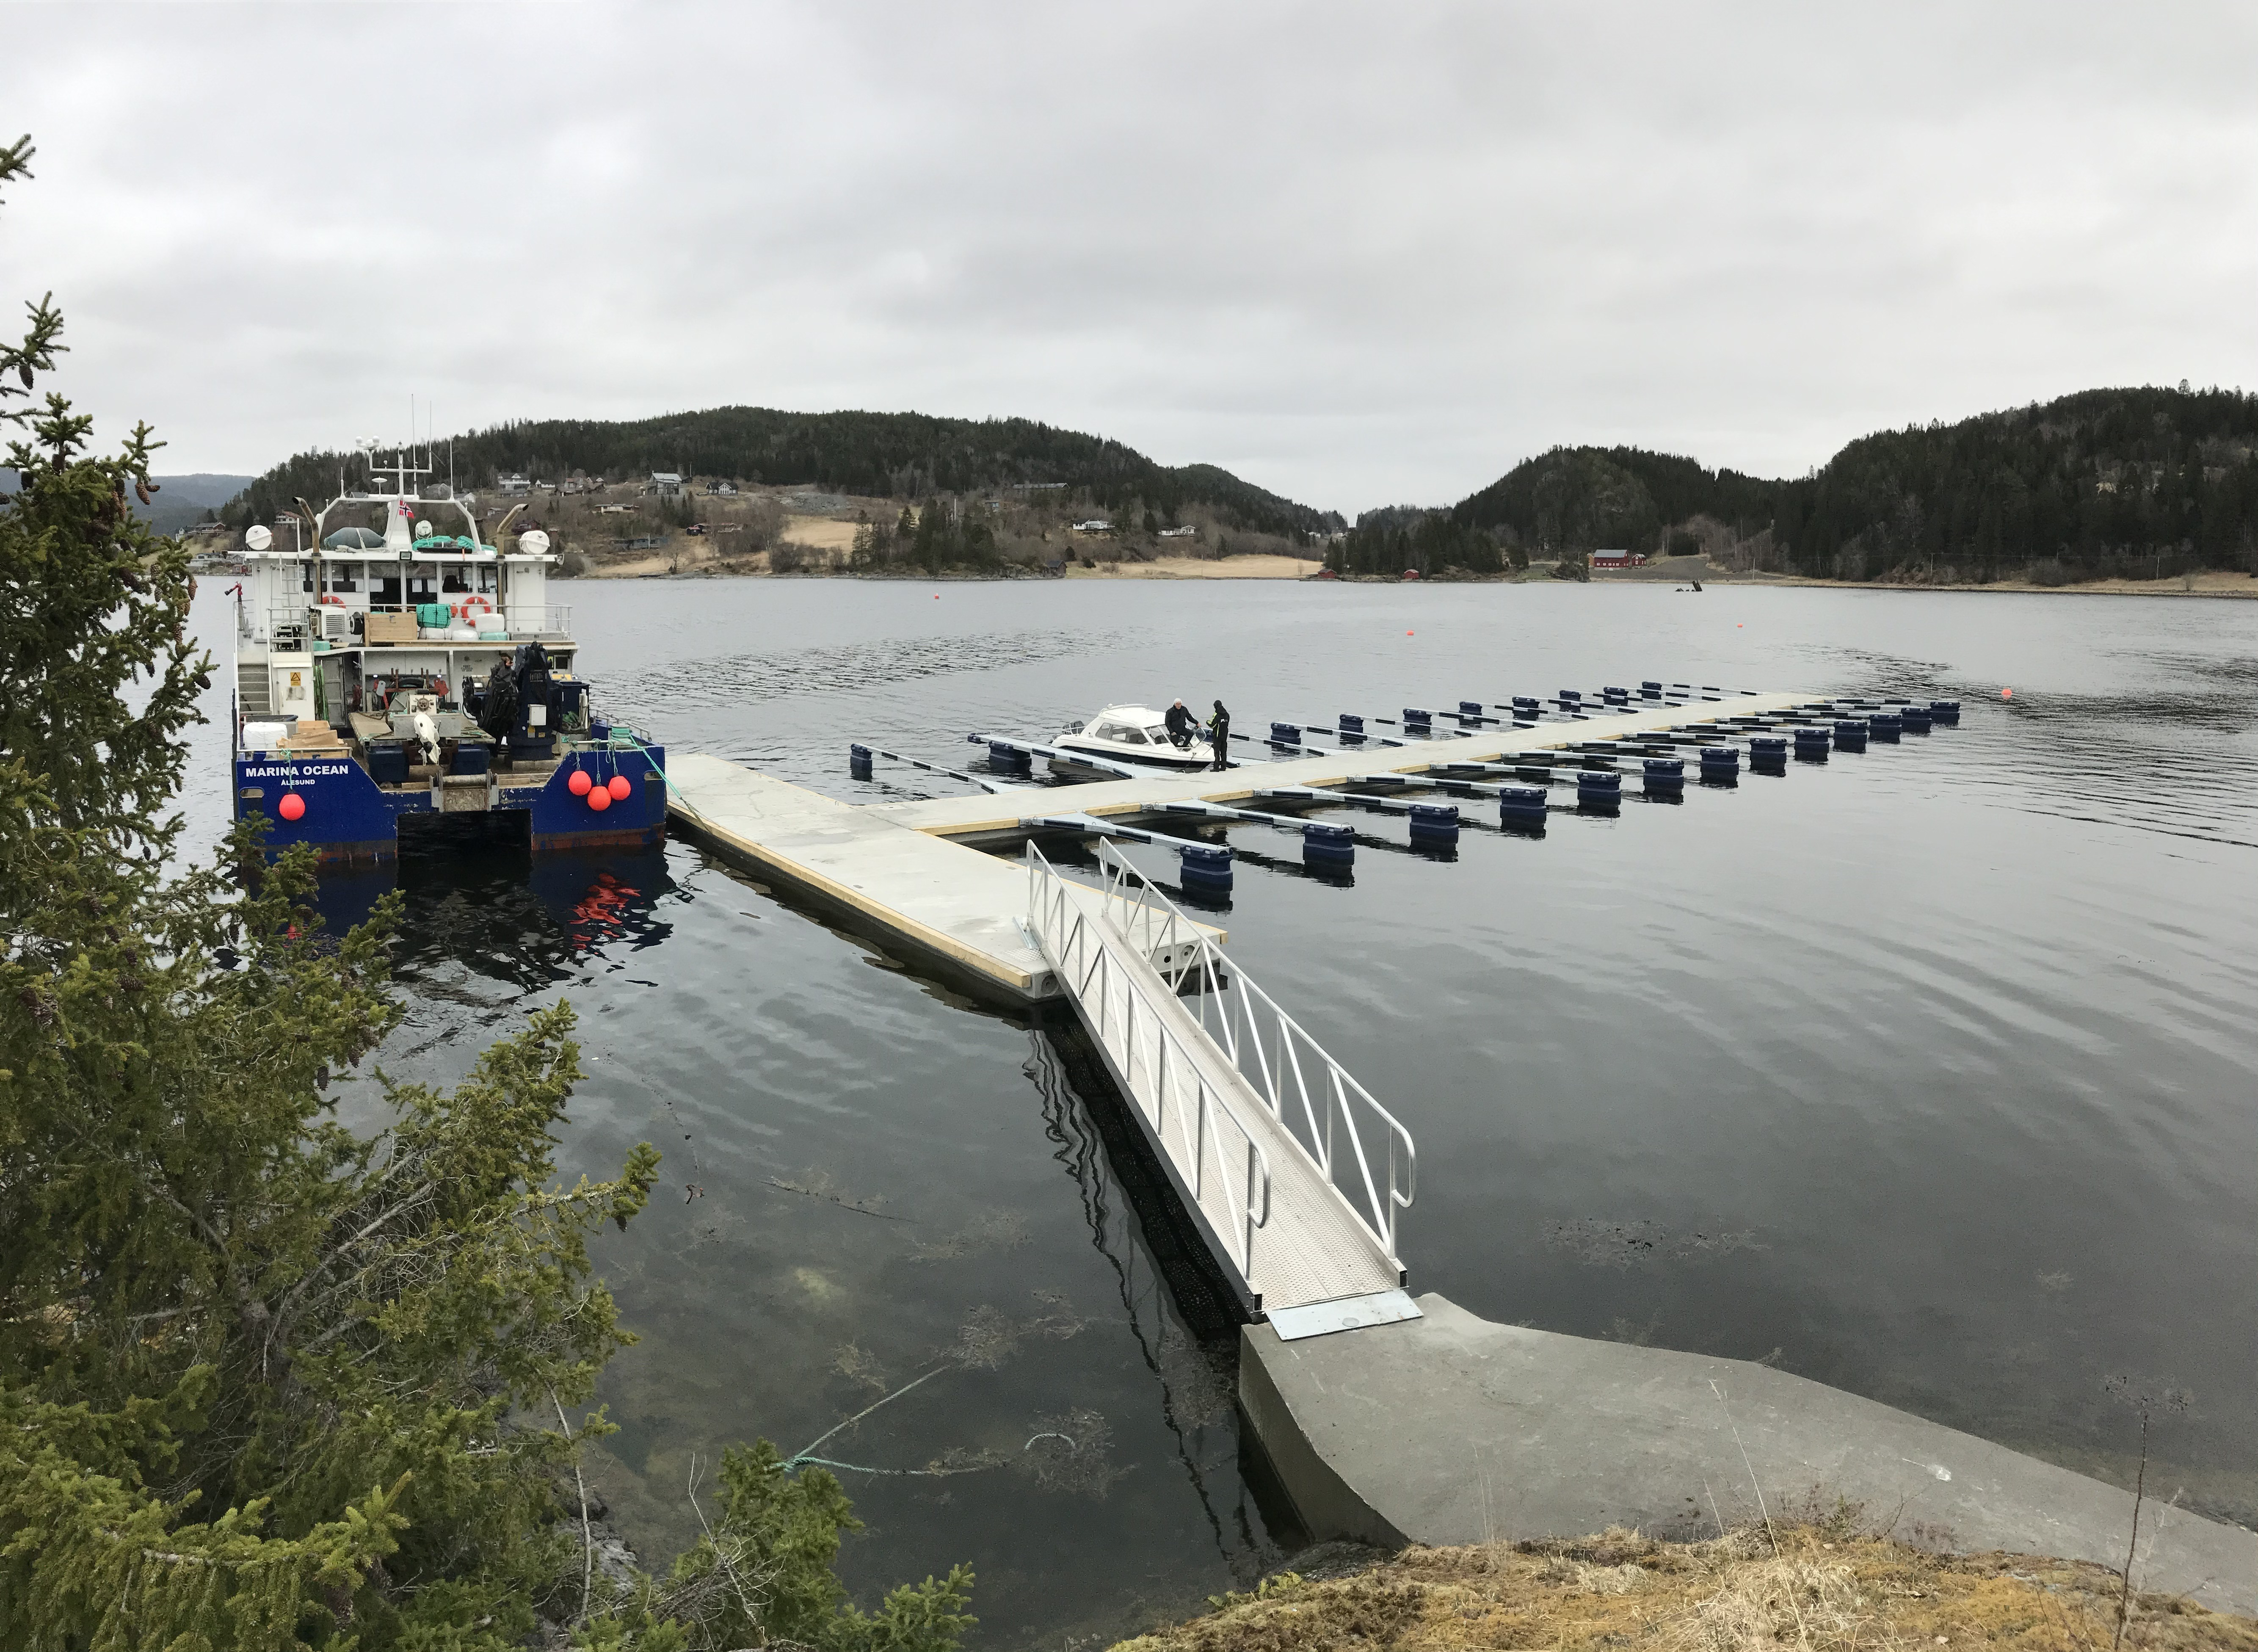 https://marinasolutions.no/uploads/Undli-Kai-Bryggeforening_Åsenfjord-6.jpg